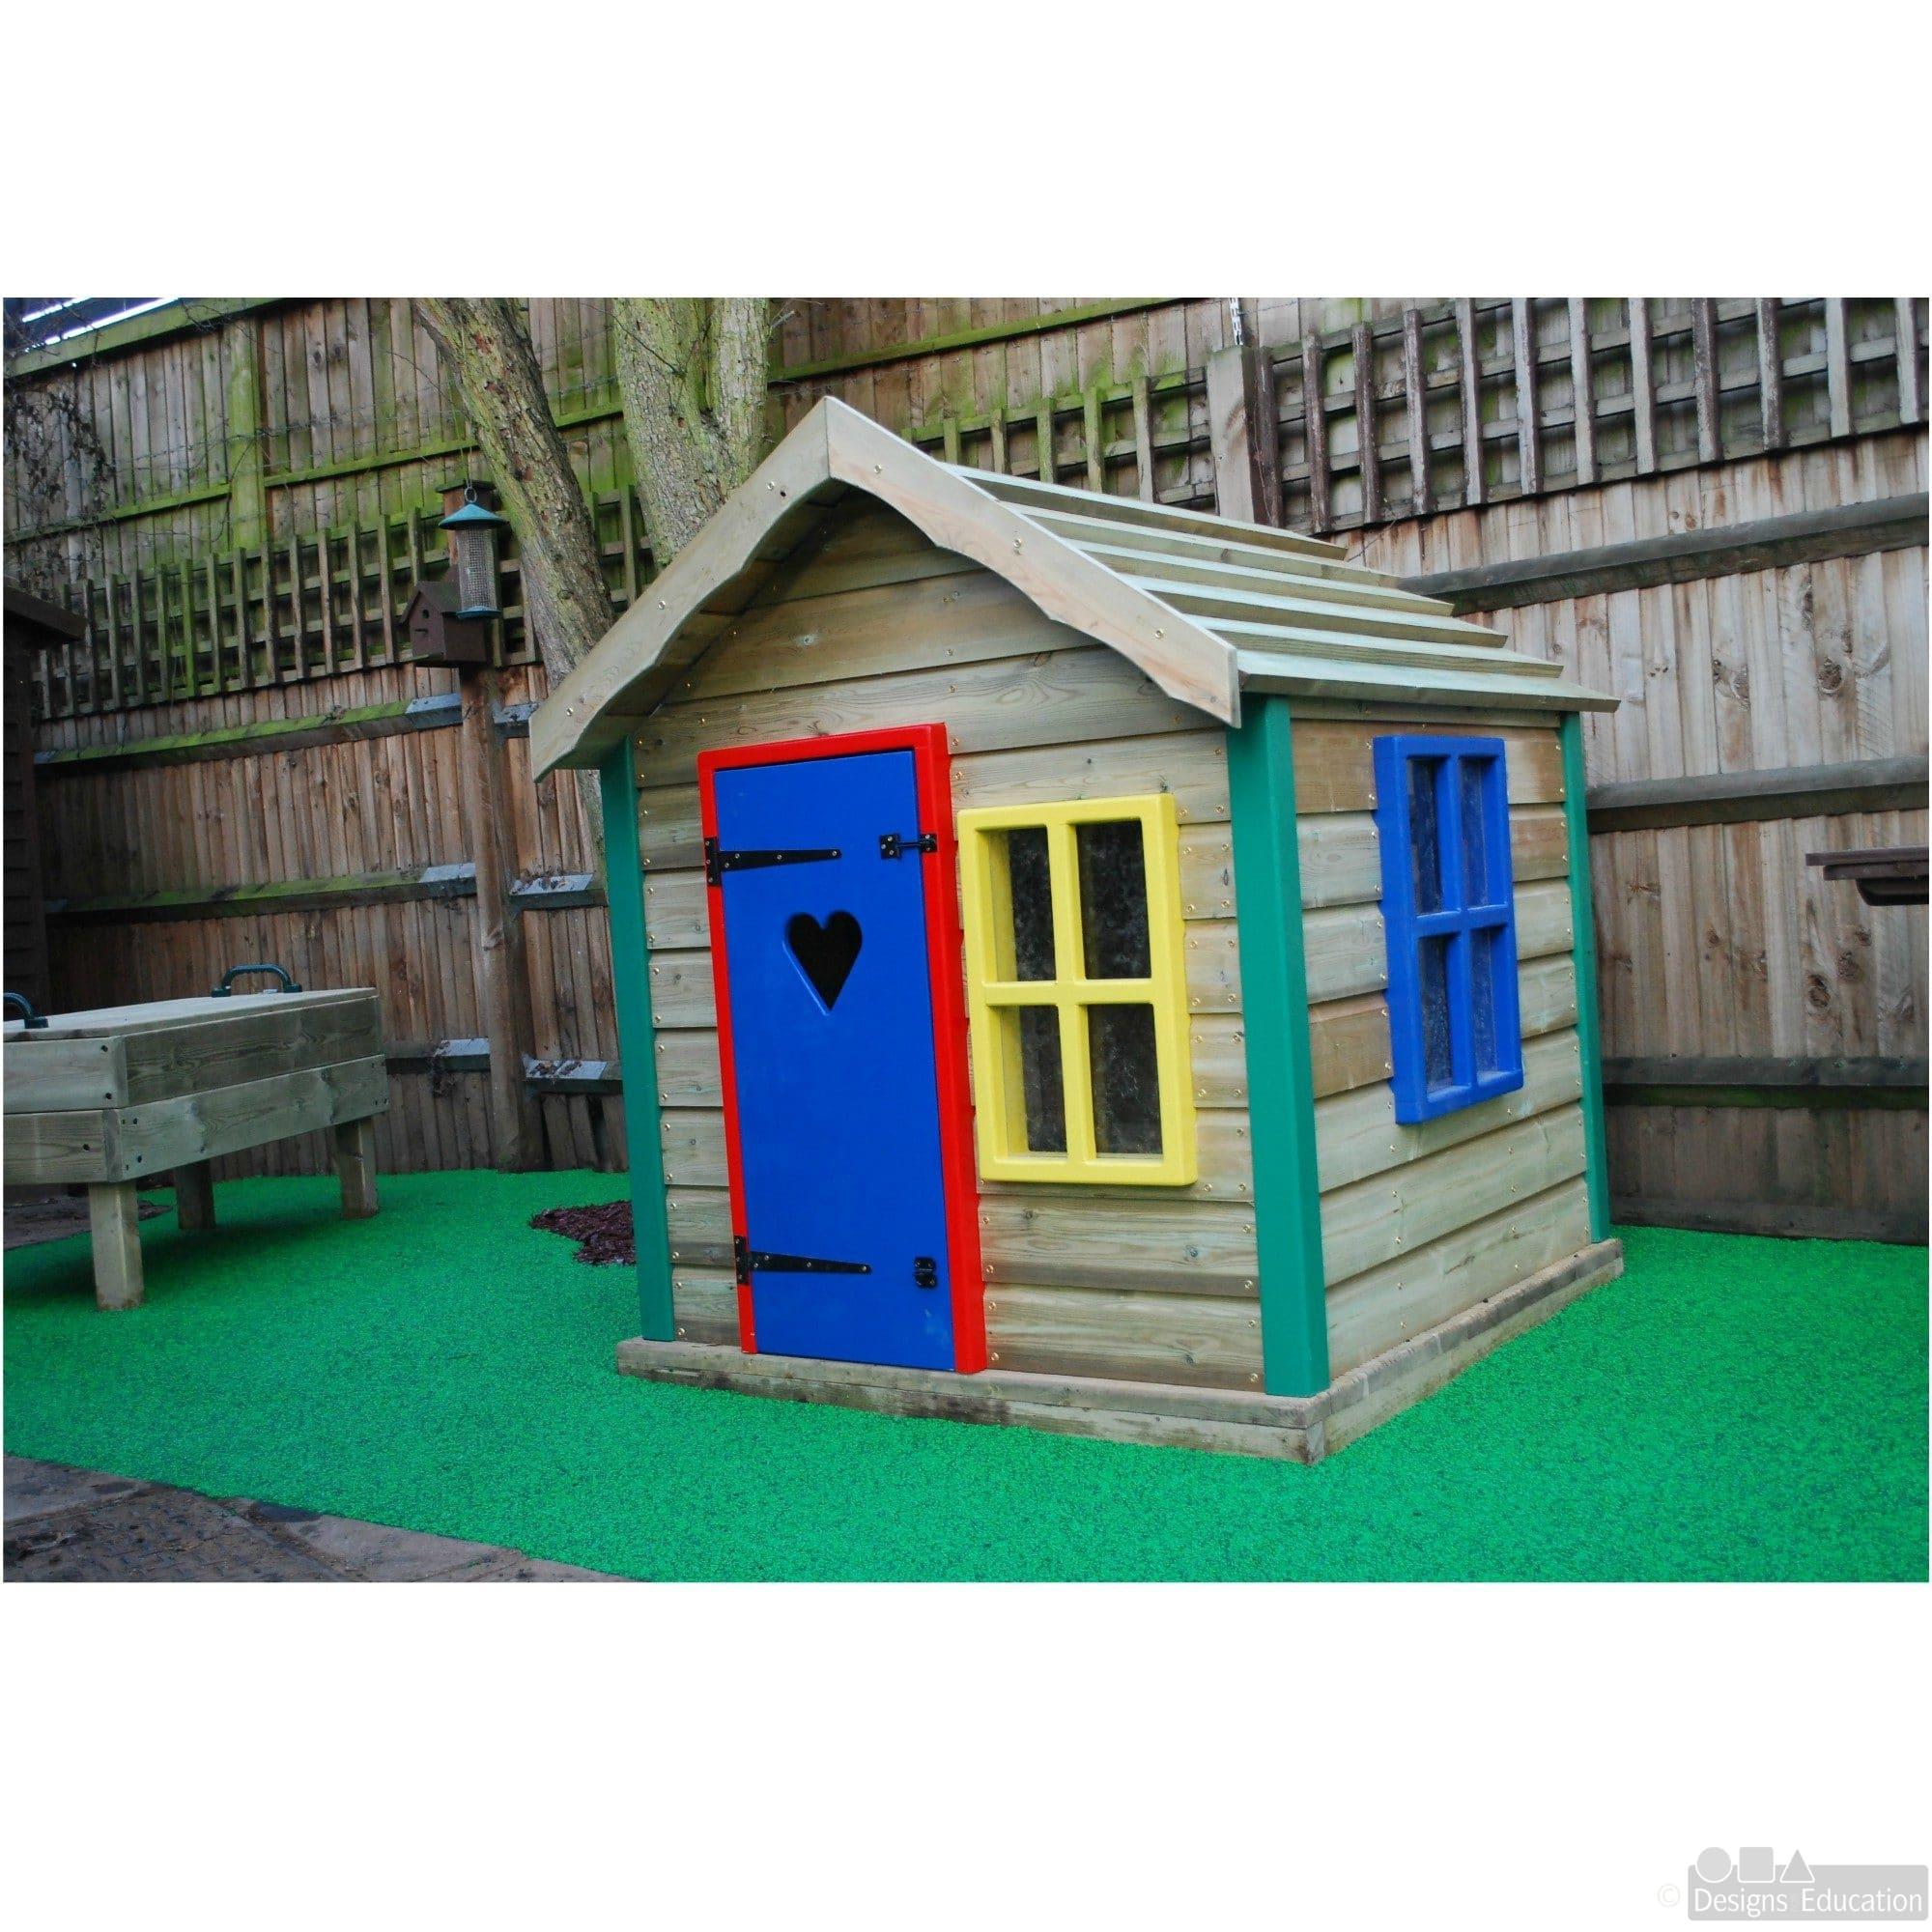 Hansel gretal play house designs for education - Hansel home ...